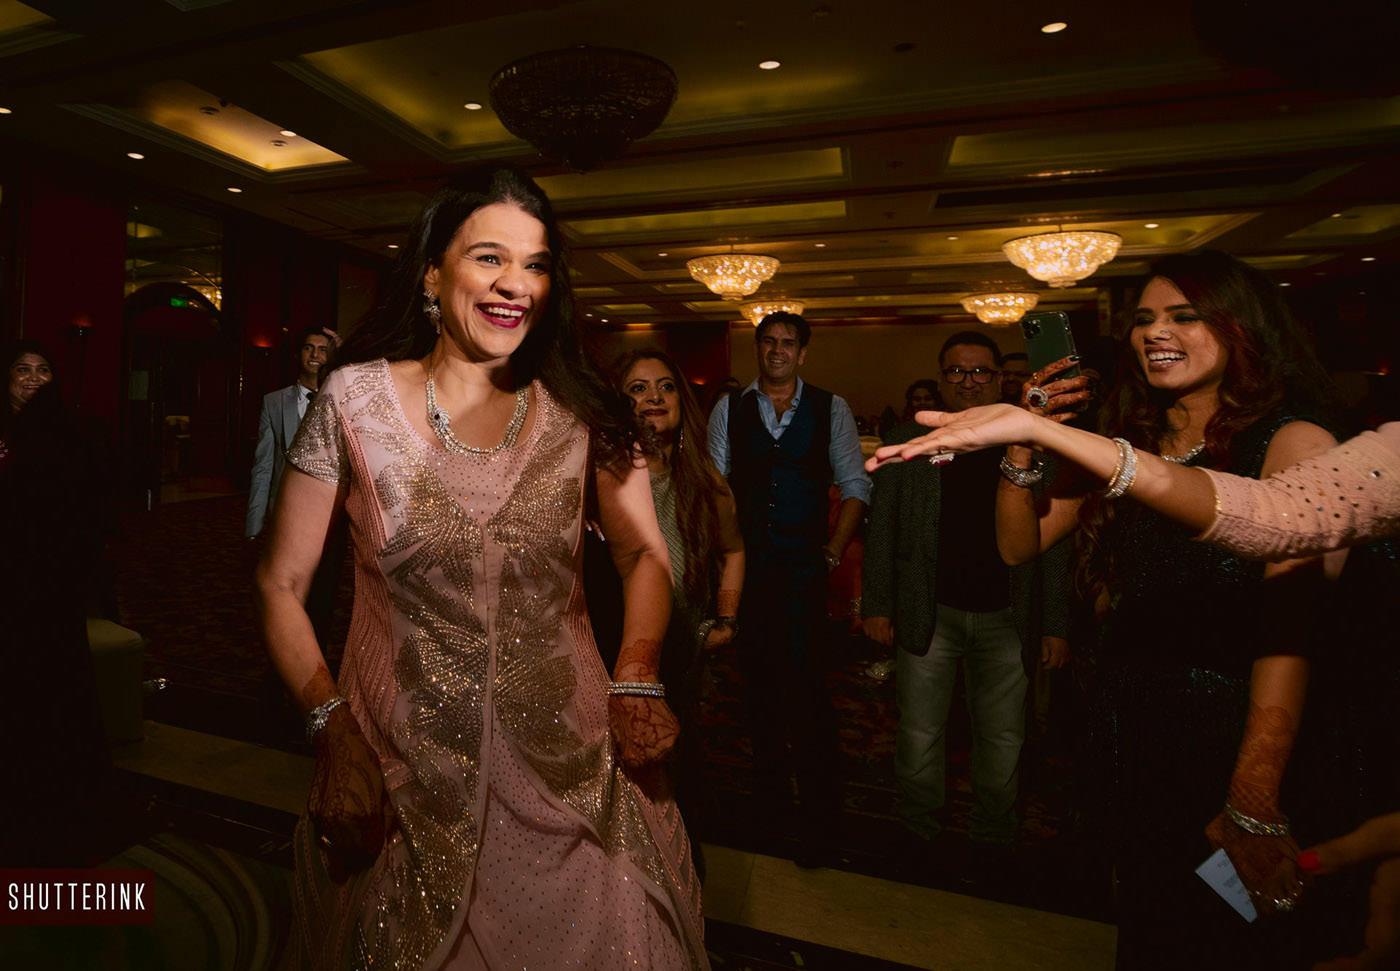 Hindu wedding in Delhi